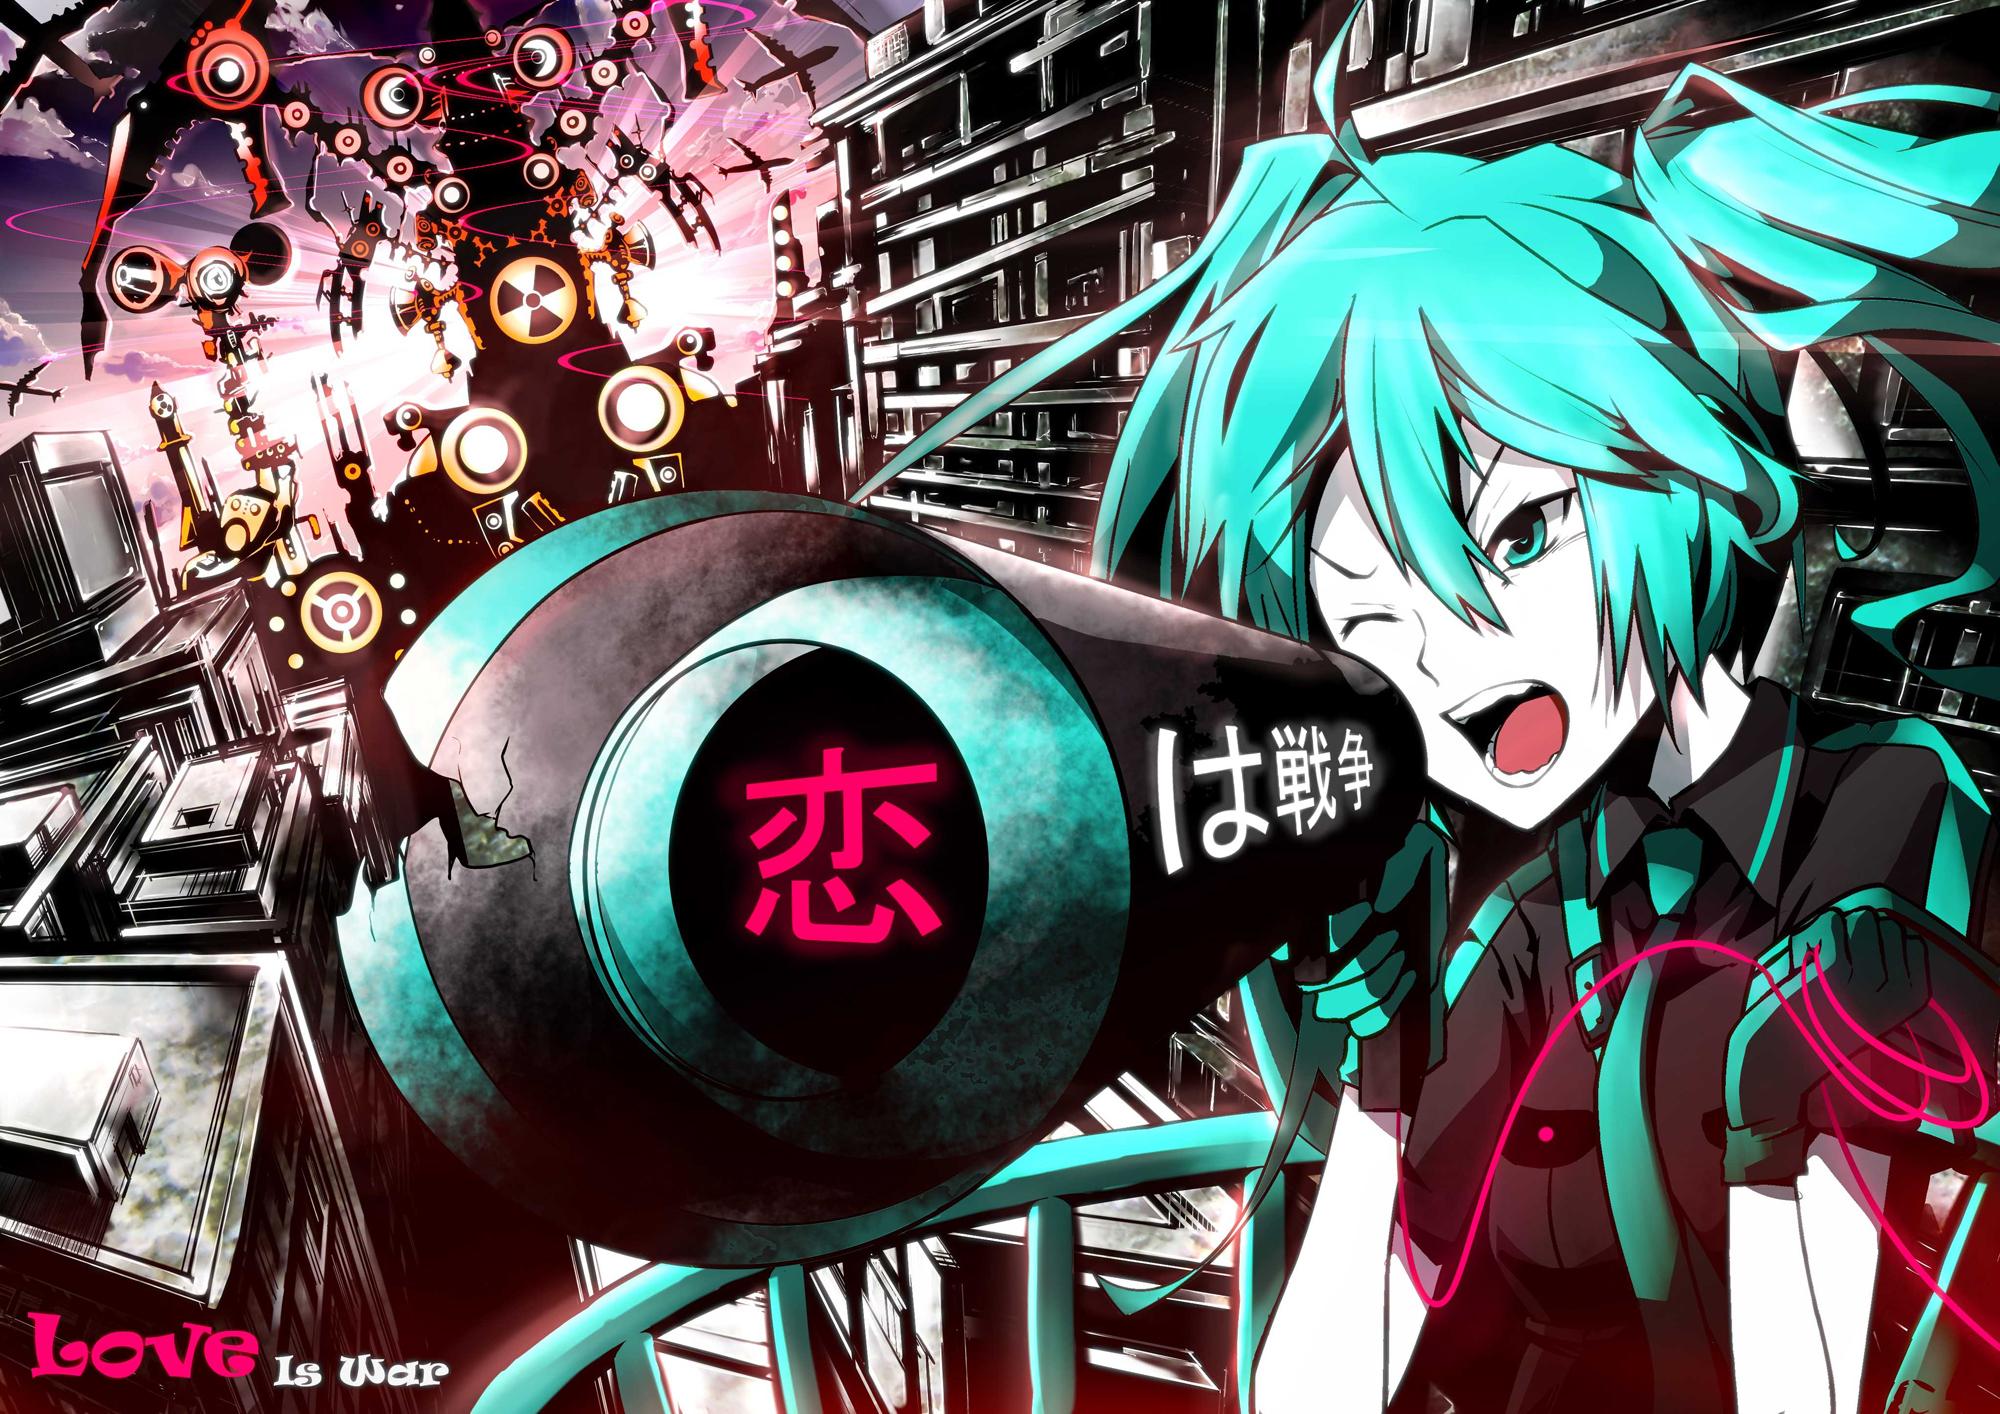 Tags Anime Sea Lordofk VOCALOID Hatsune Miku Radioactivity Sign